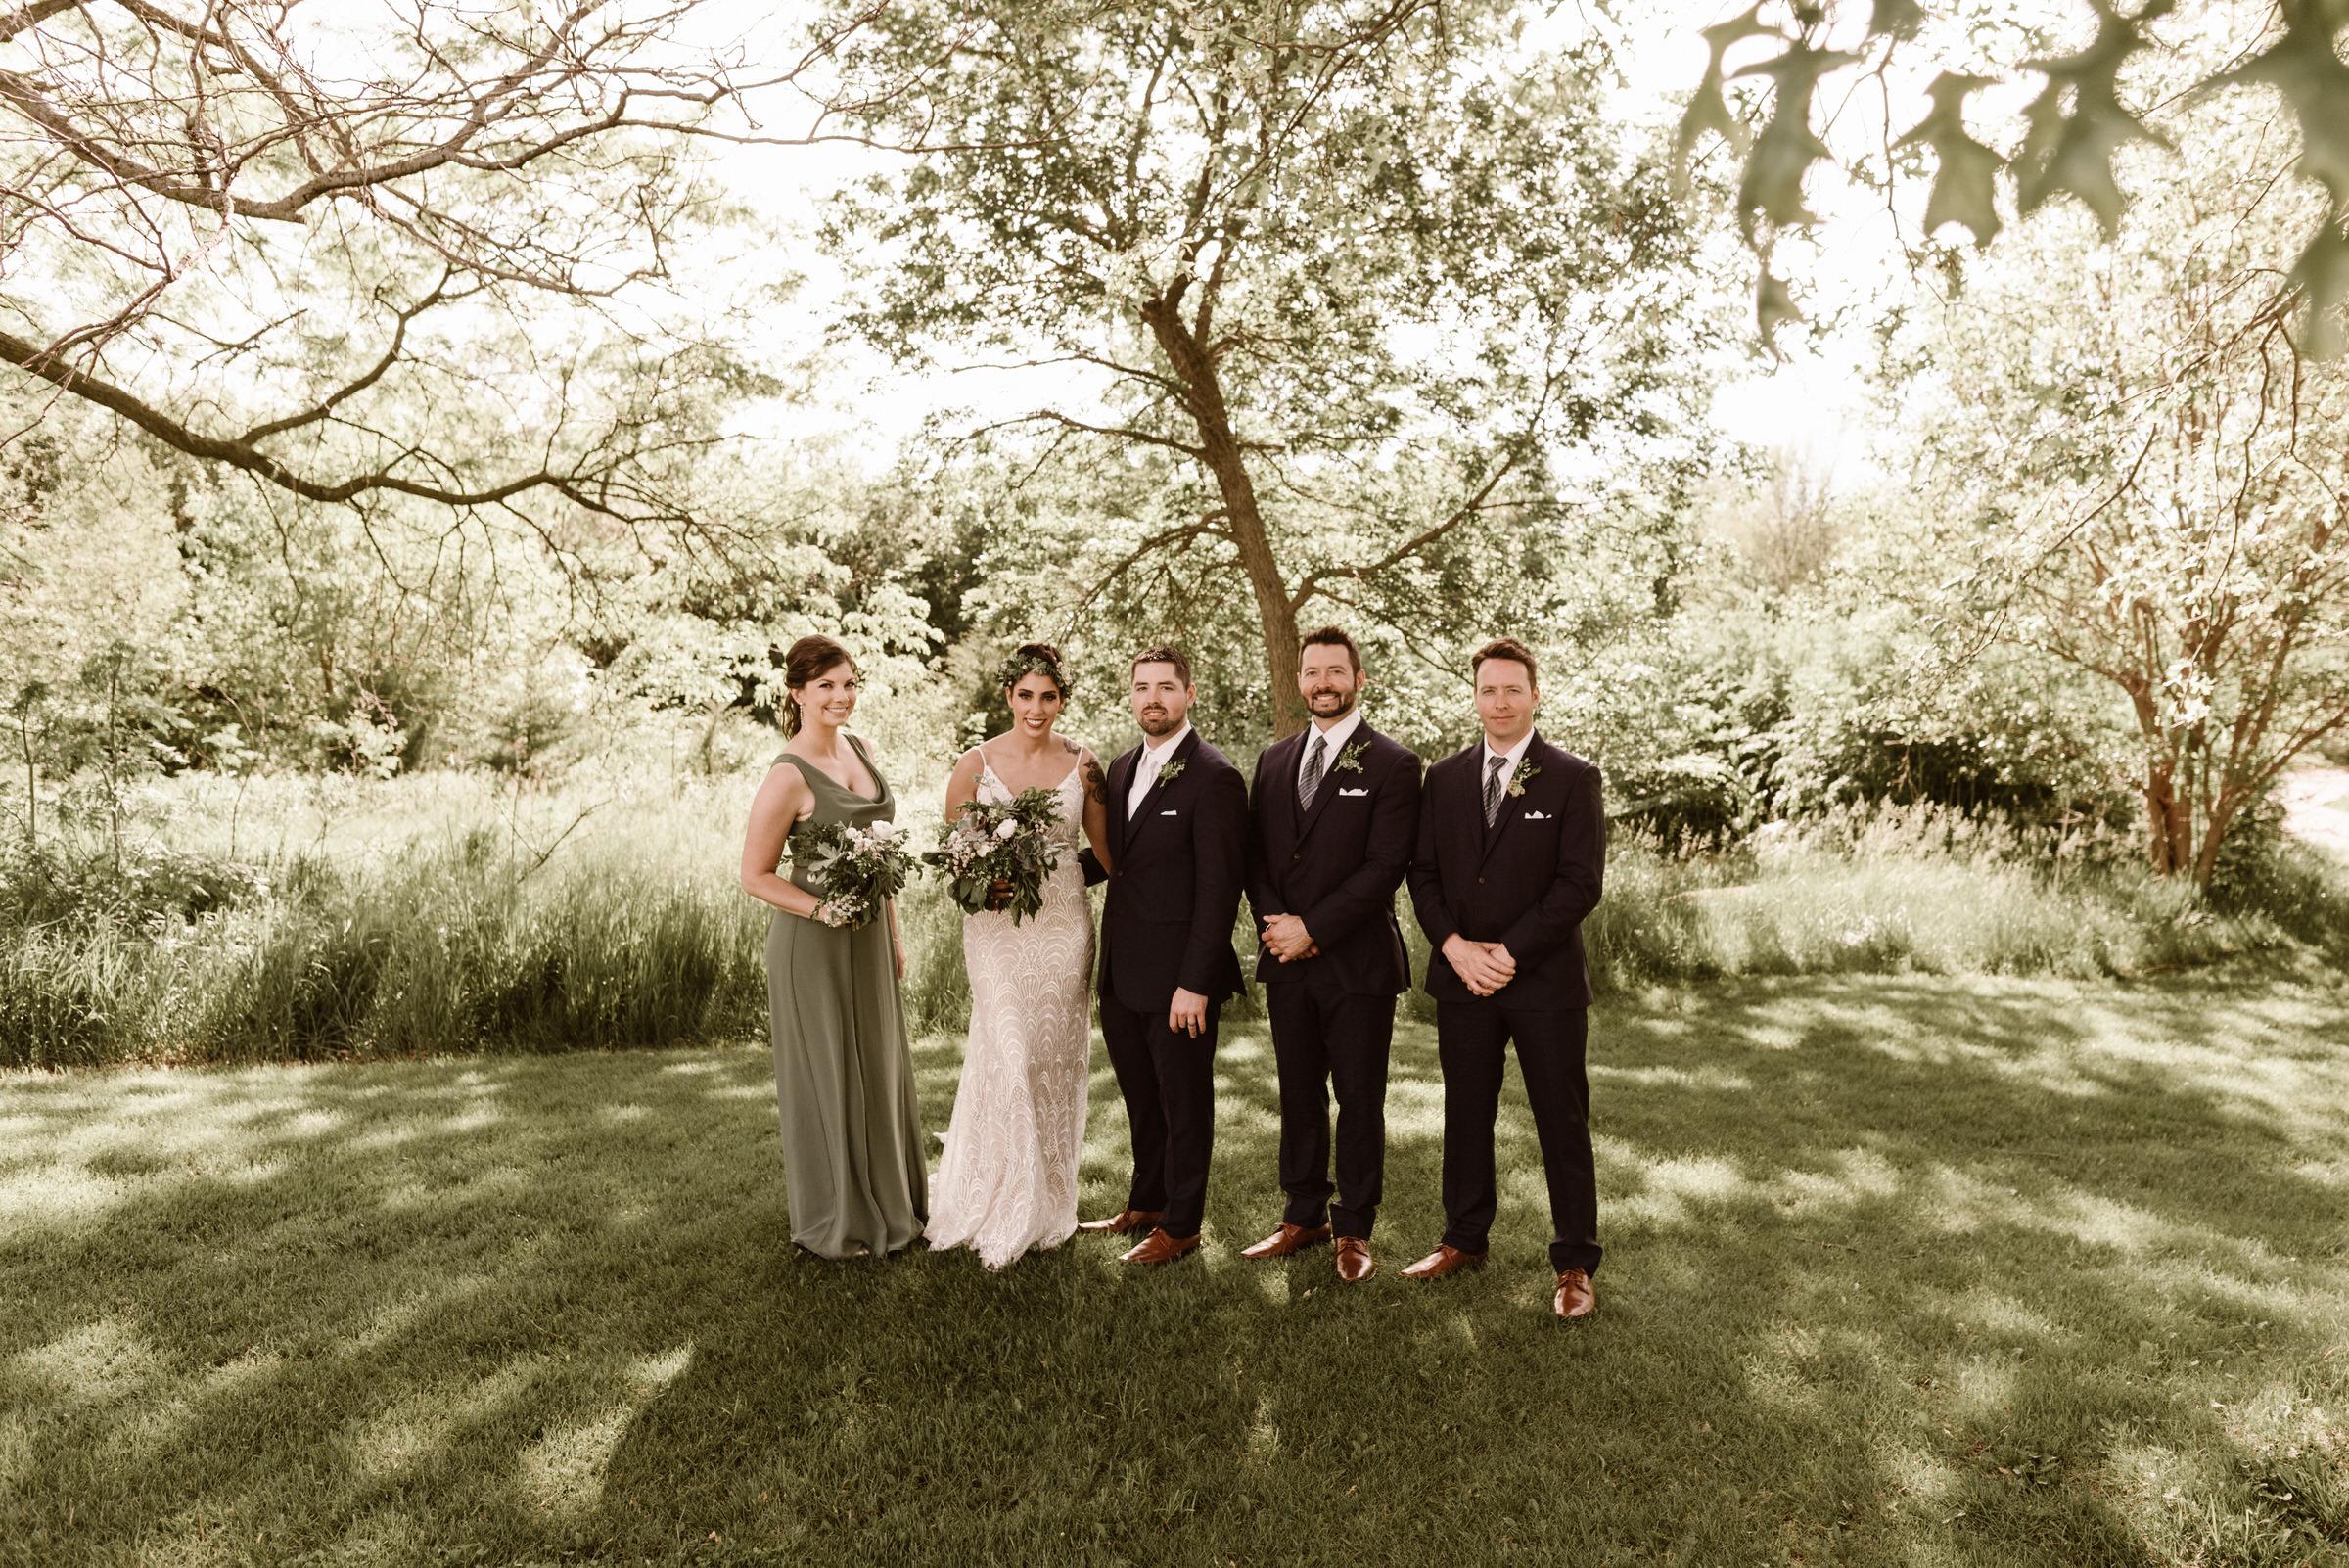 Wilderness-Ridge-Lincoln-Nebraska-Wedding-Kaylie-Sirek-Photography-067.jpg